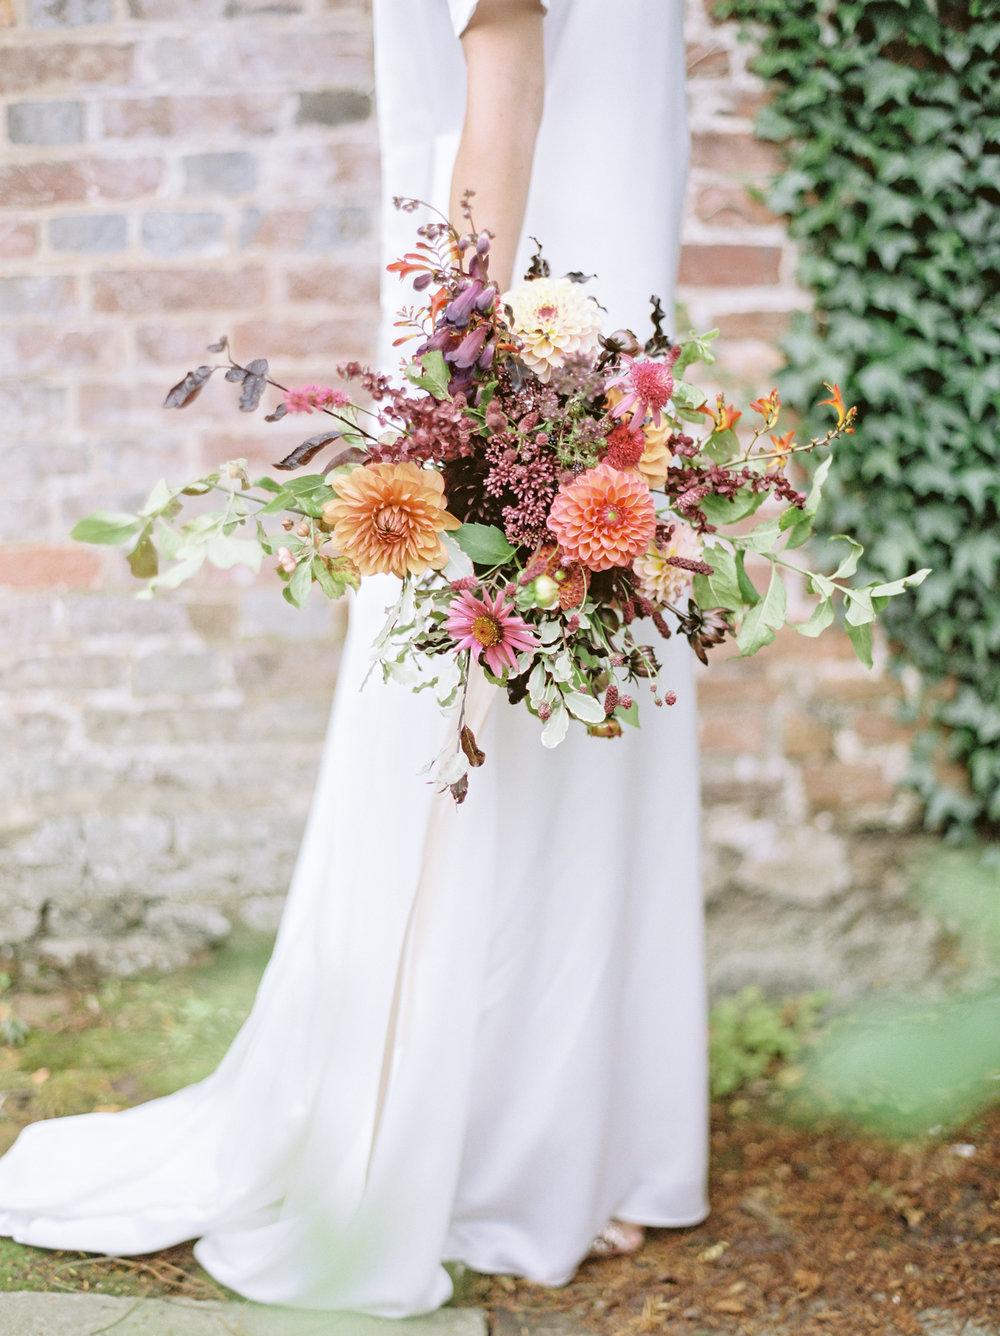 Natural style bridal bouquet